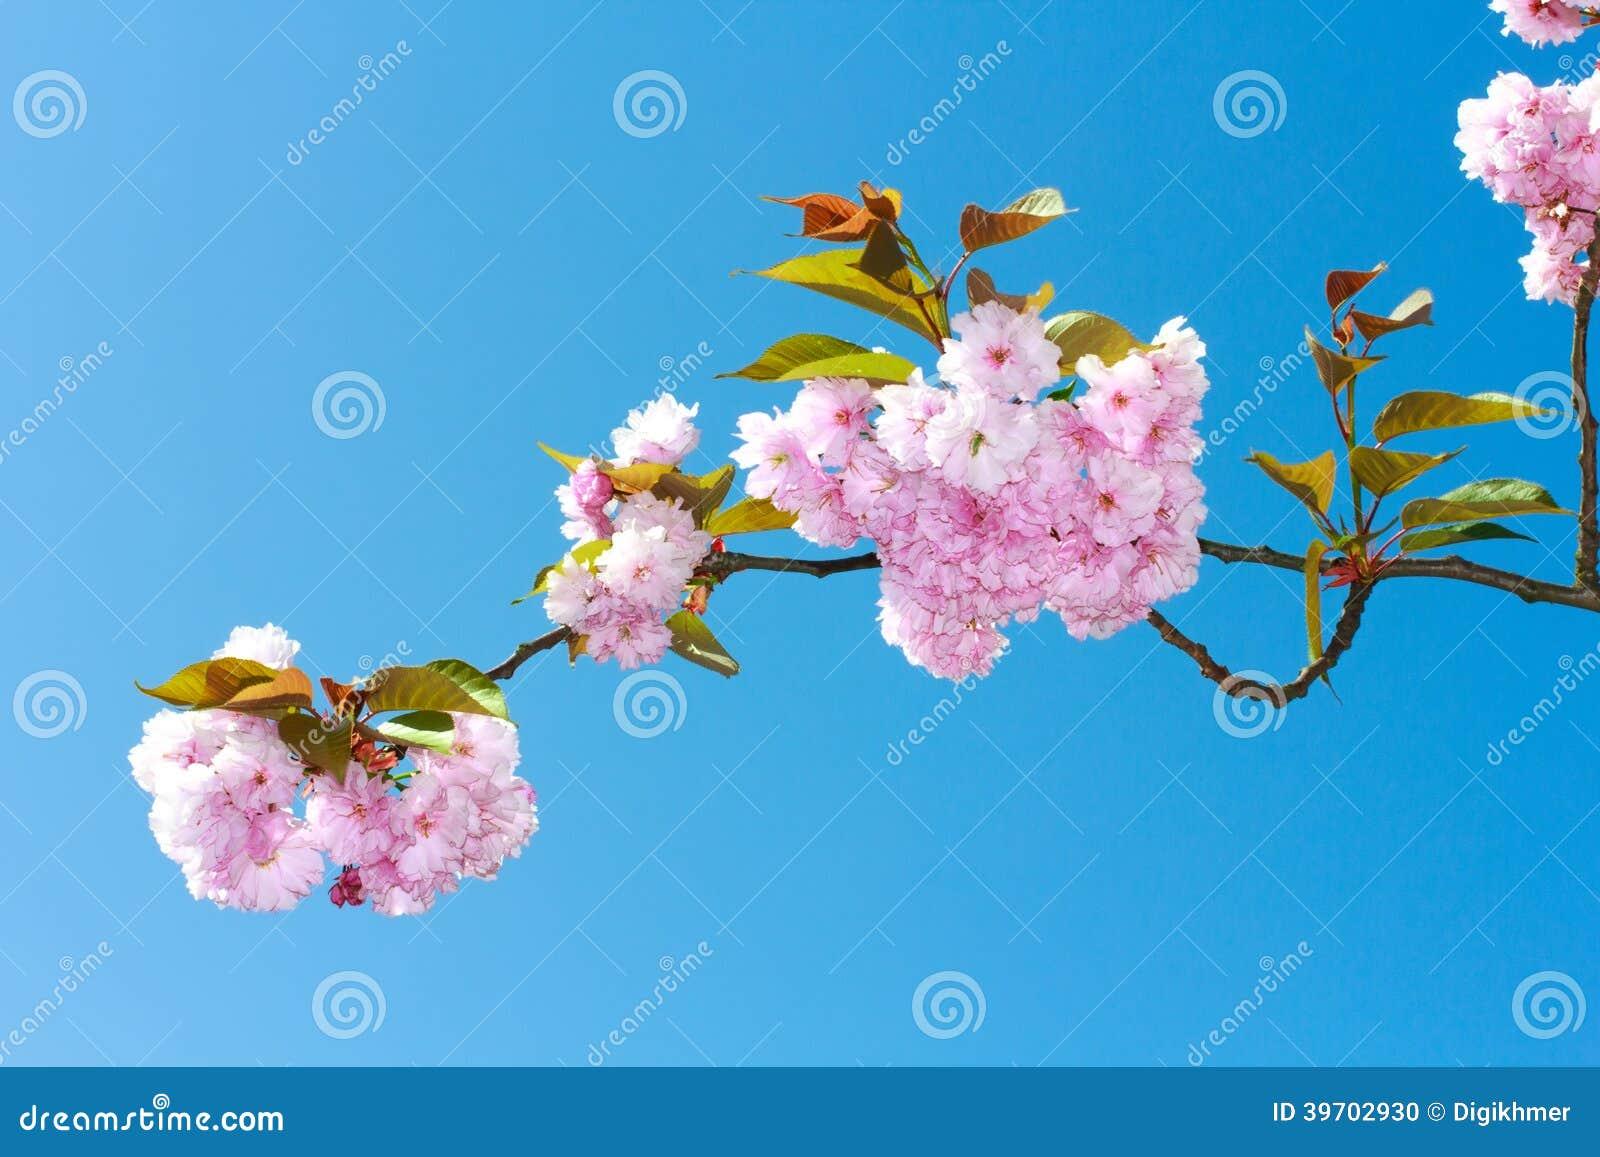 Flowers sakura spring pink blossoms